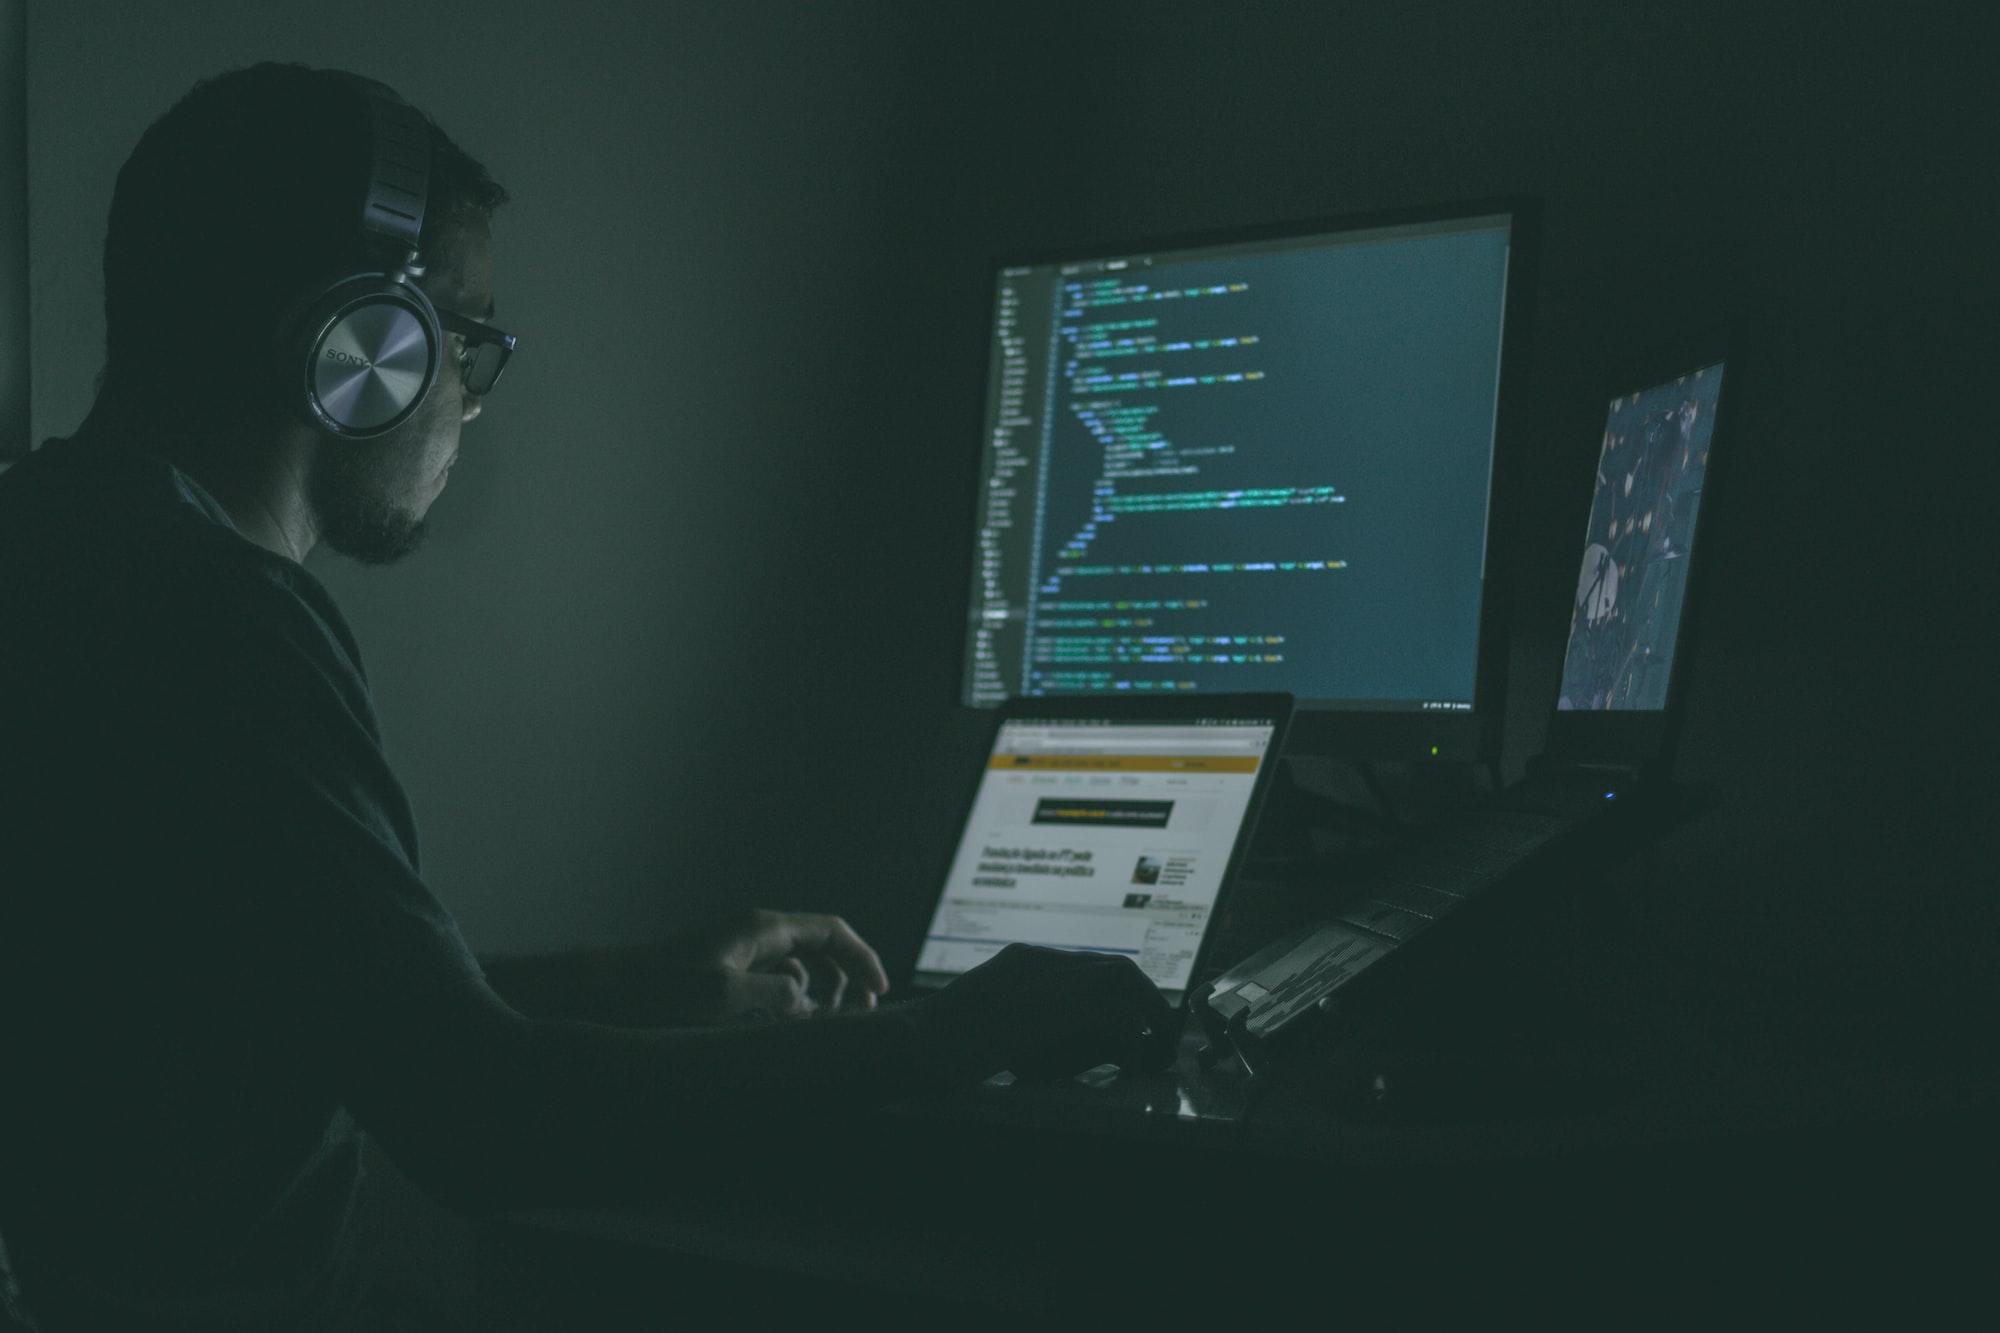 GITEX Technology Week 2021